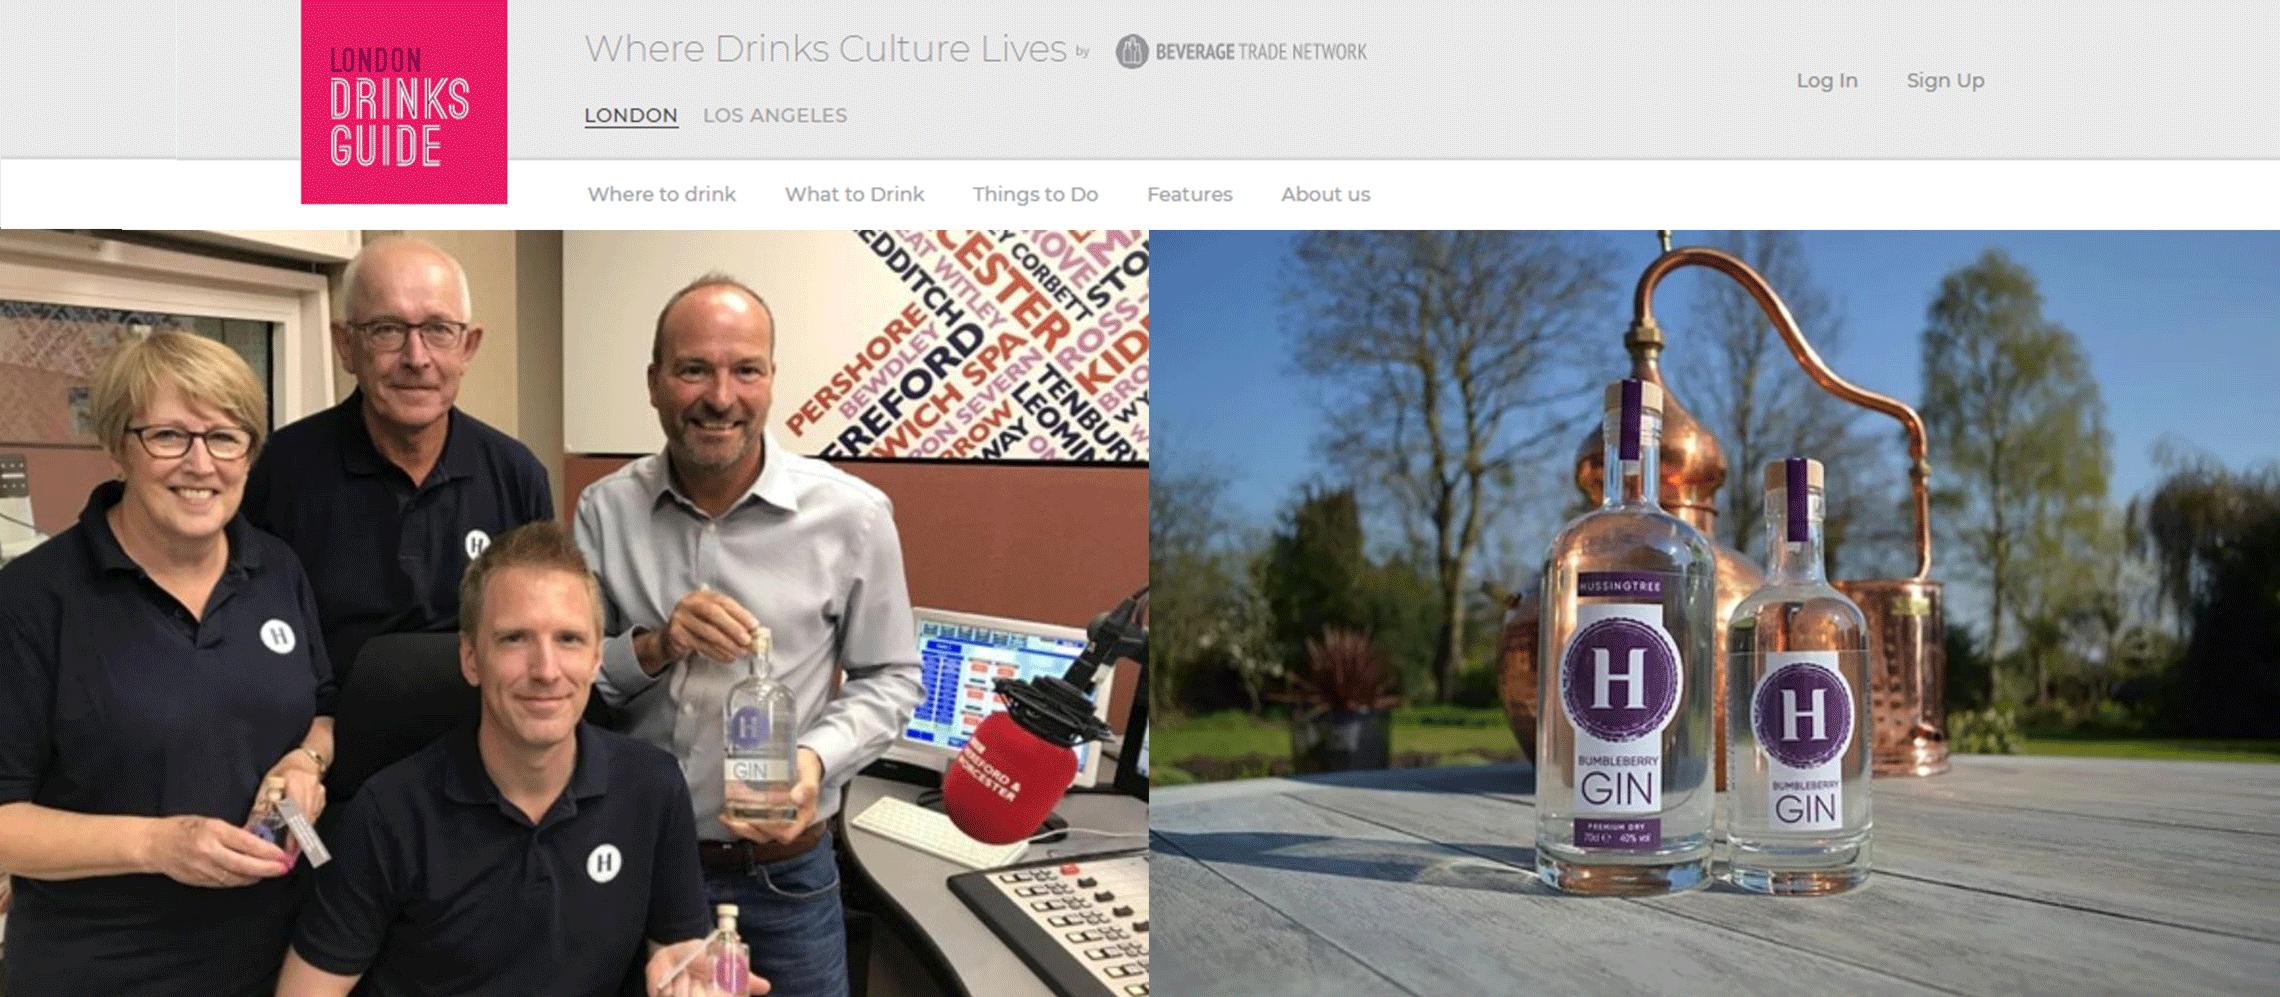 Photo for: Hussingtree Gin - Award-Winning Premium Distilled Worcester Gin